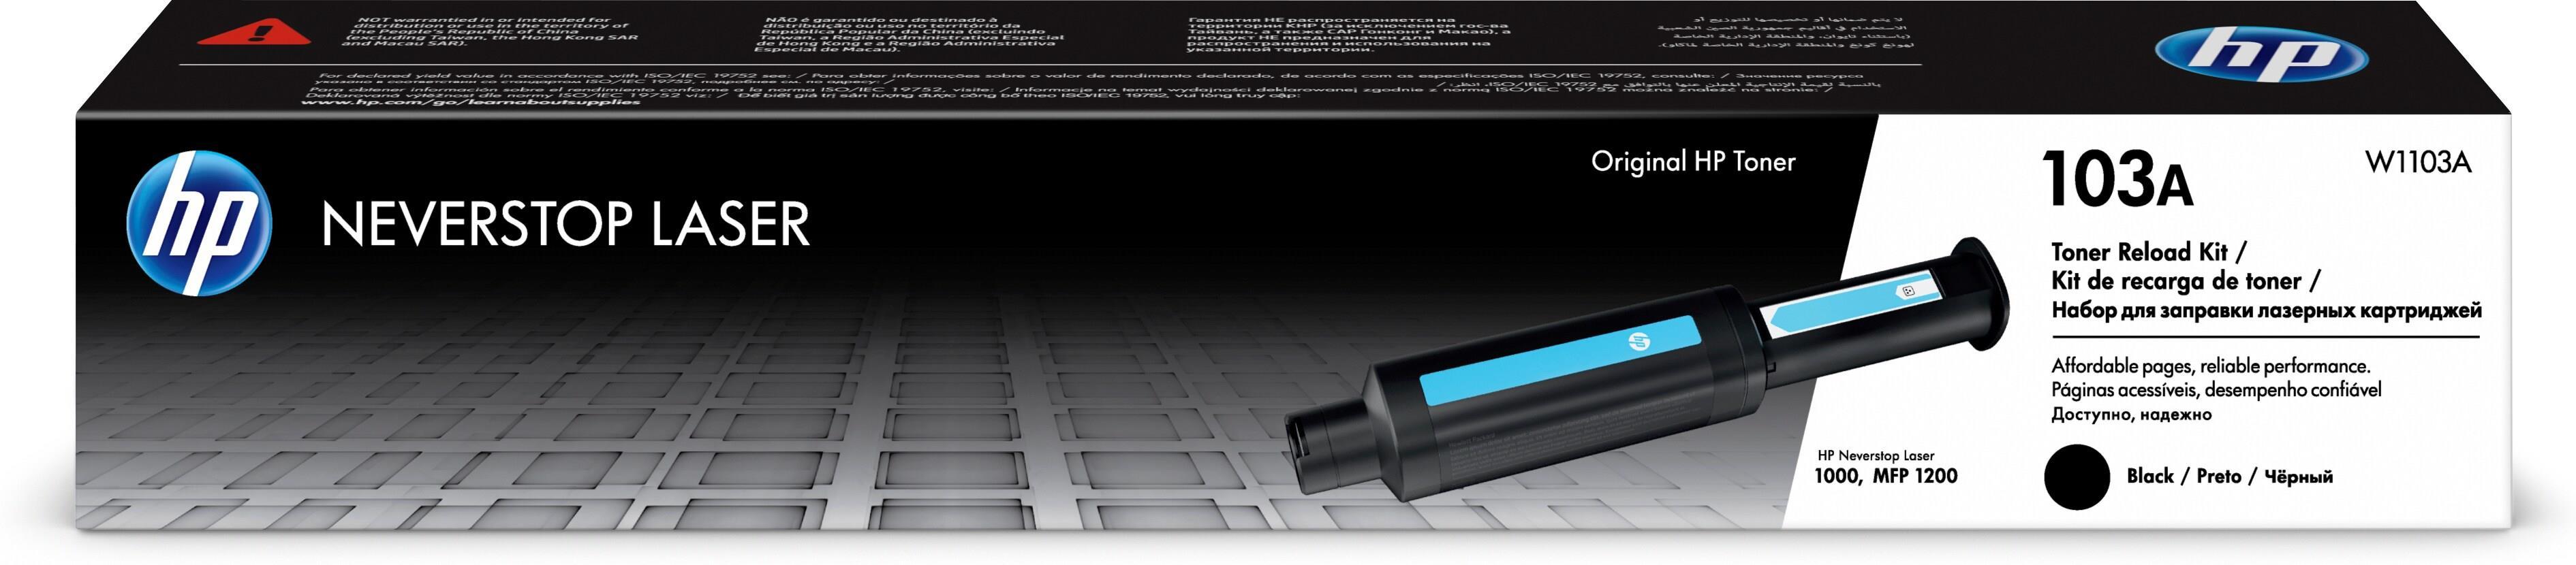 HP Neverstop W1103A - Kit de